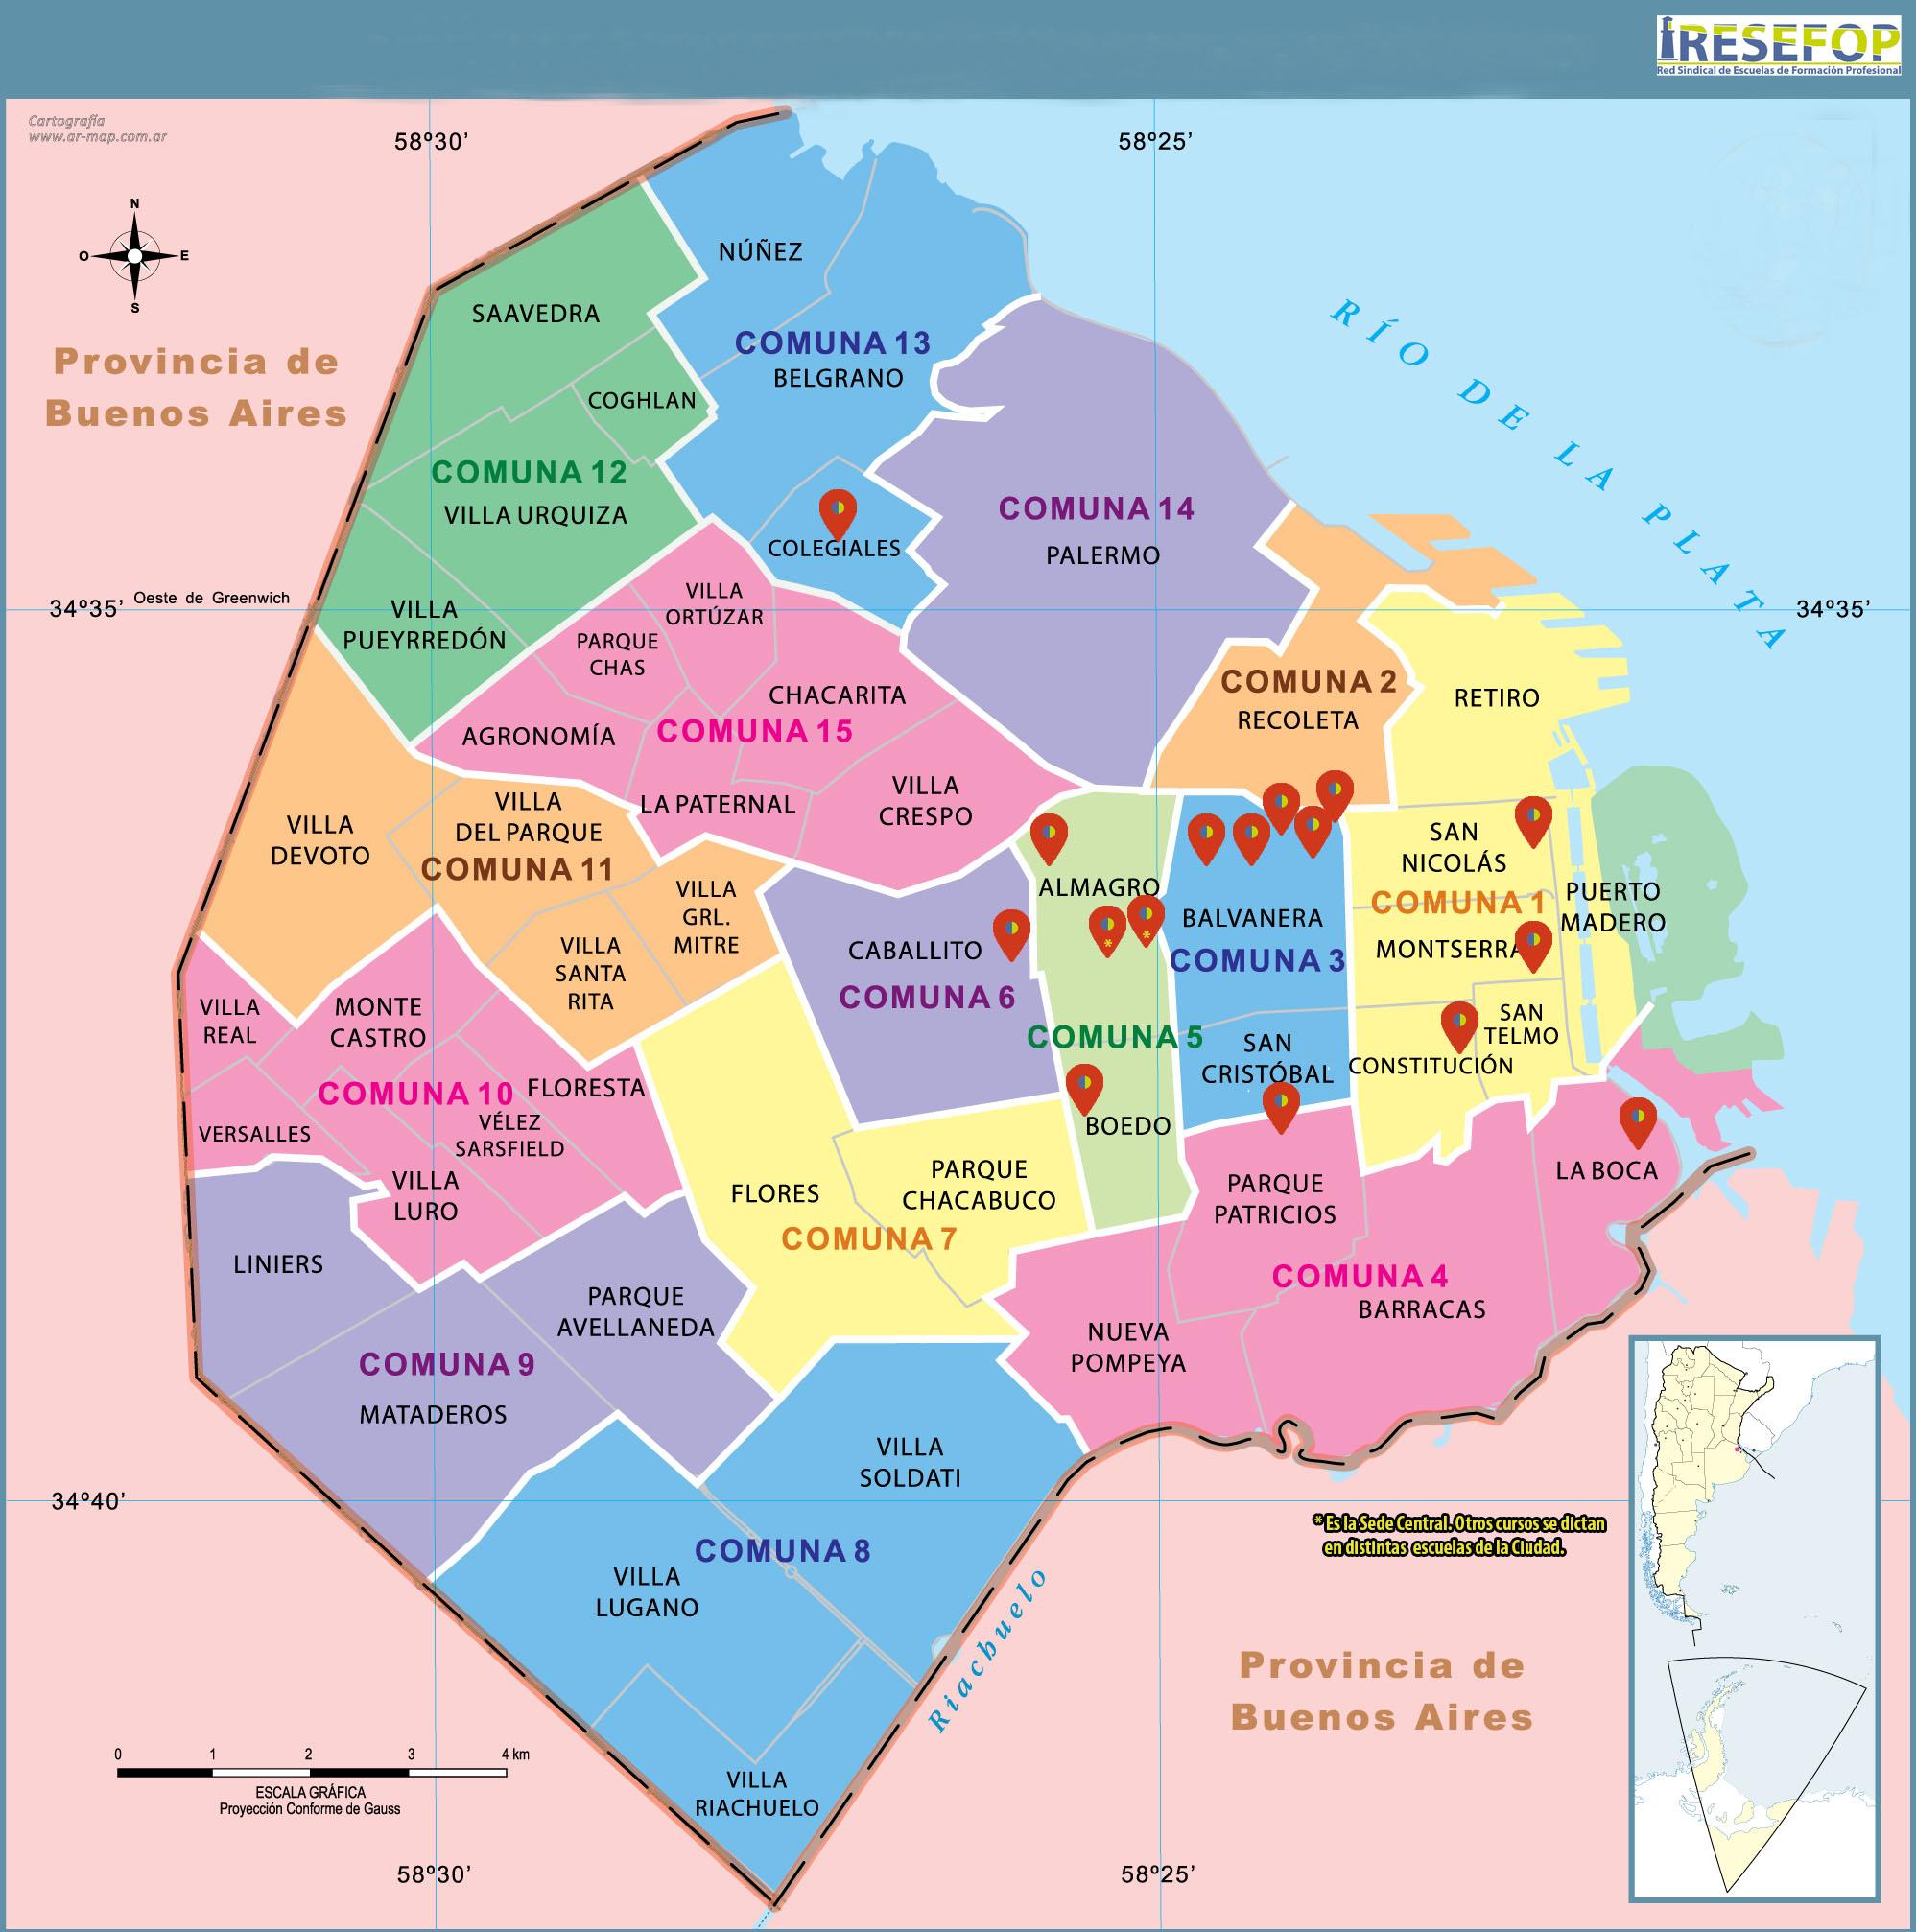 Mapa-cfp-resefop-caba